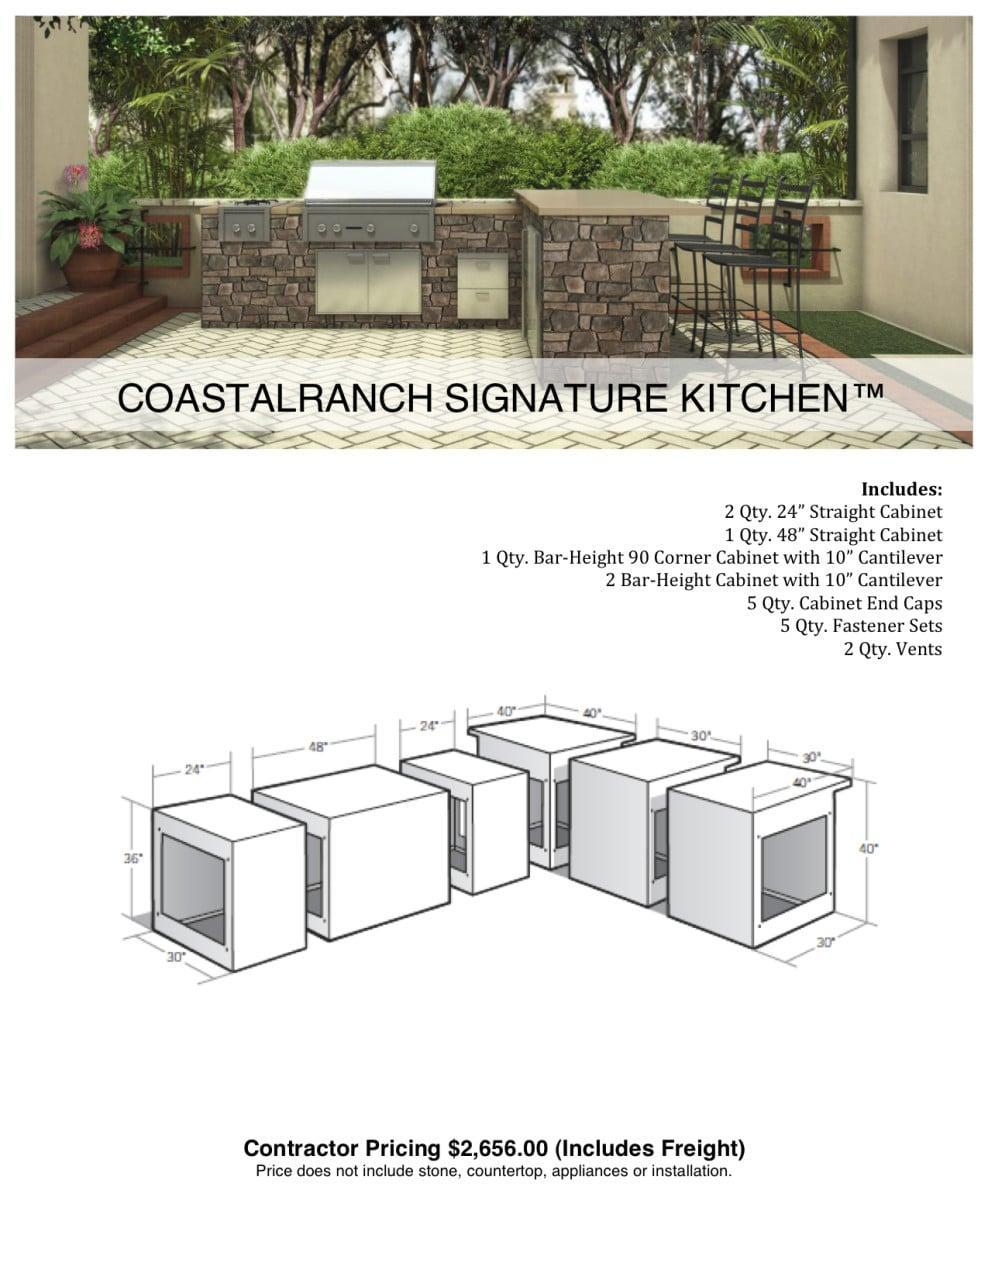 Eldorado Coastalranch Signature Kitchen